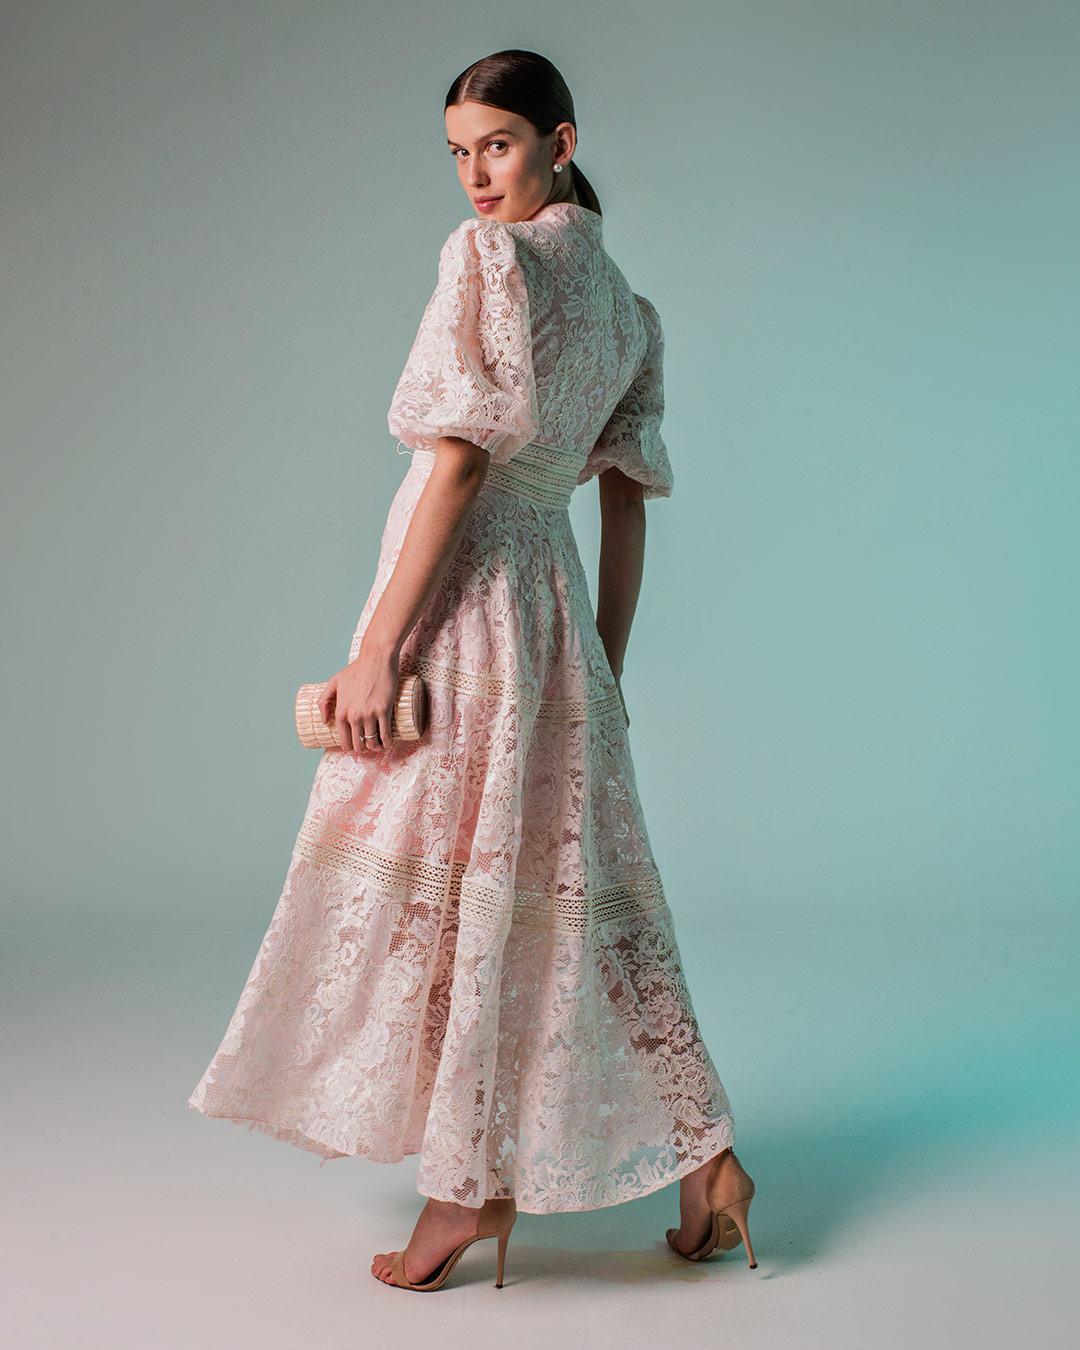 Vestido de renda cordonê com mangas bufantes